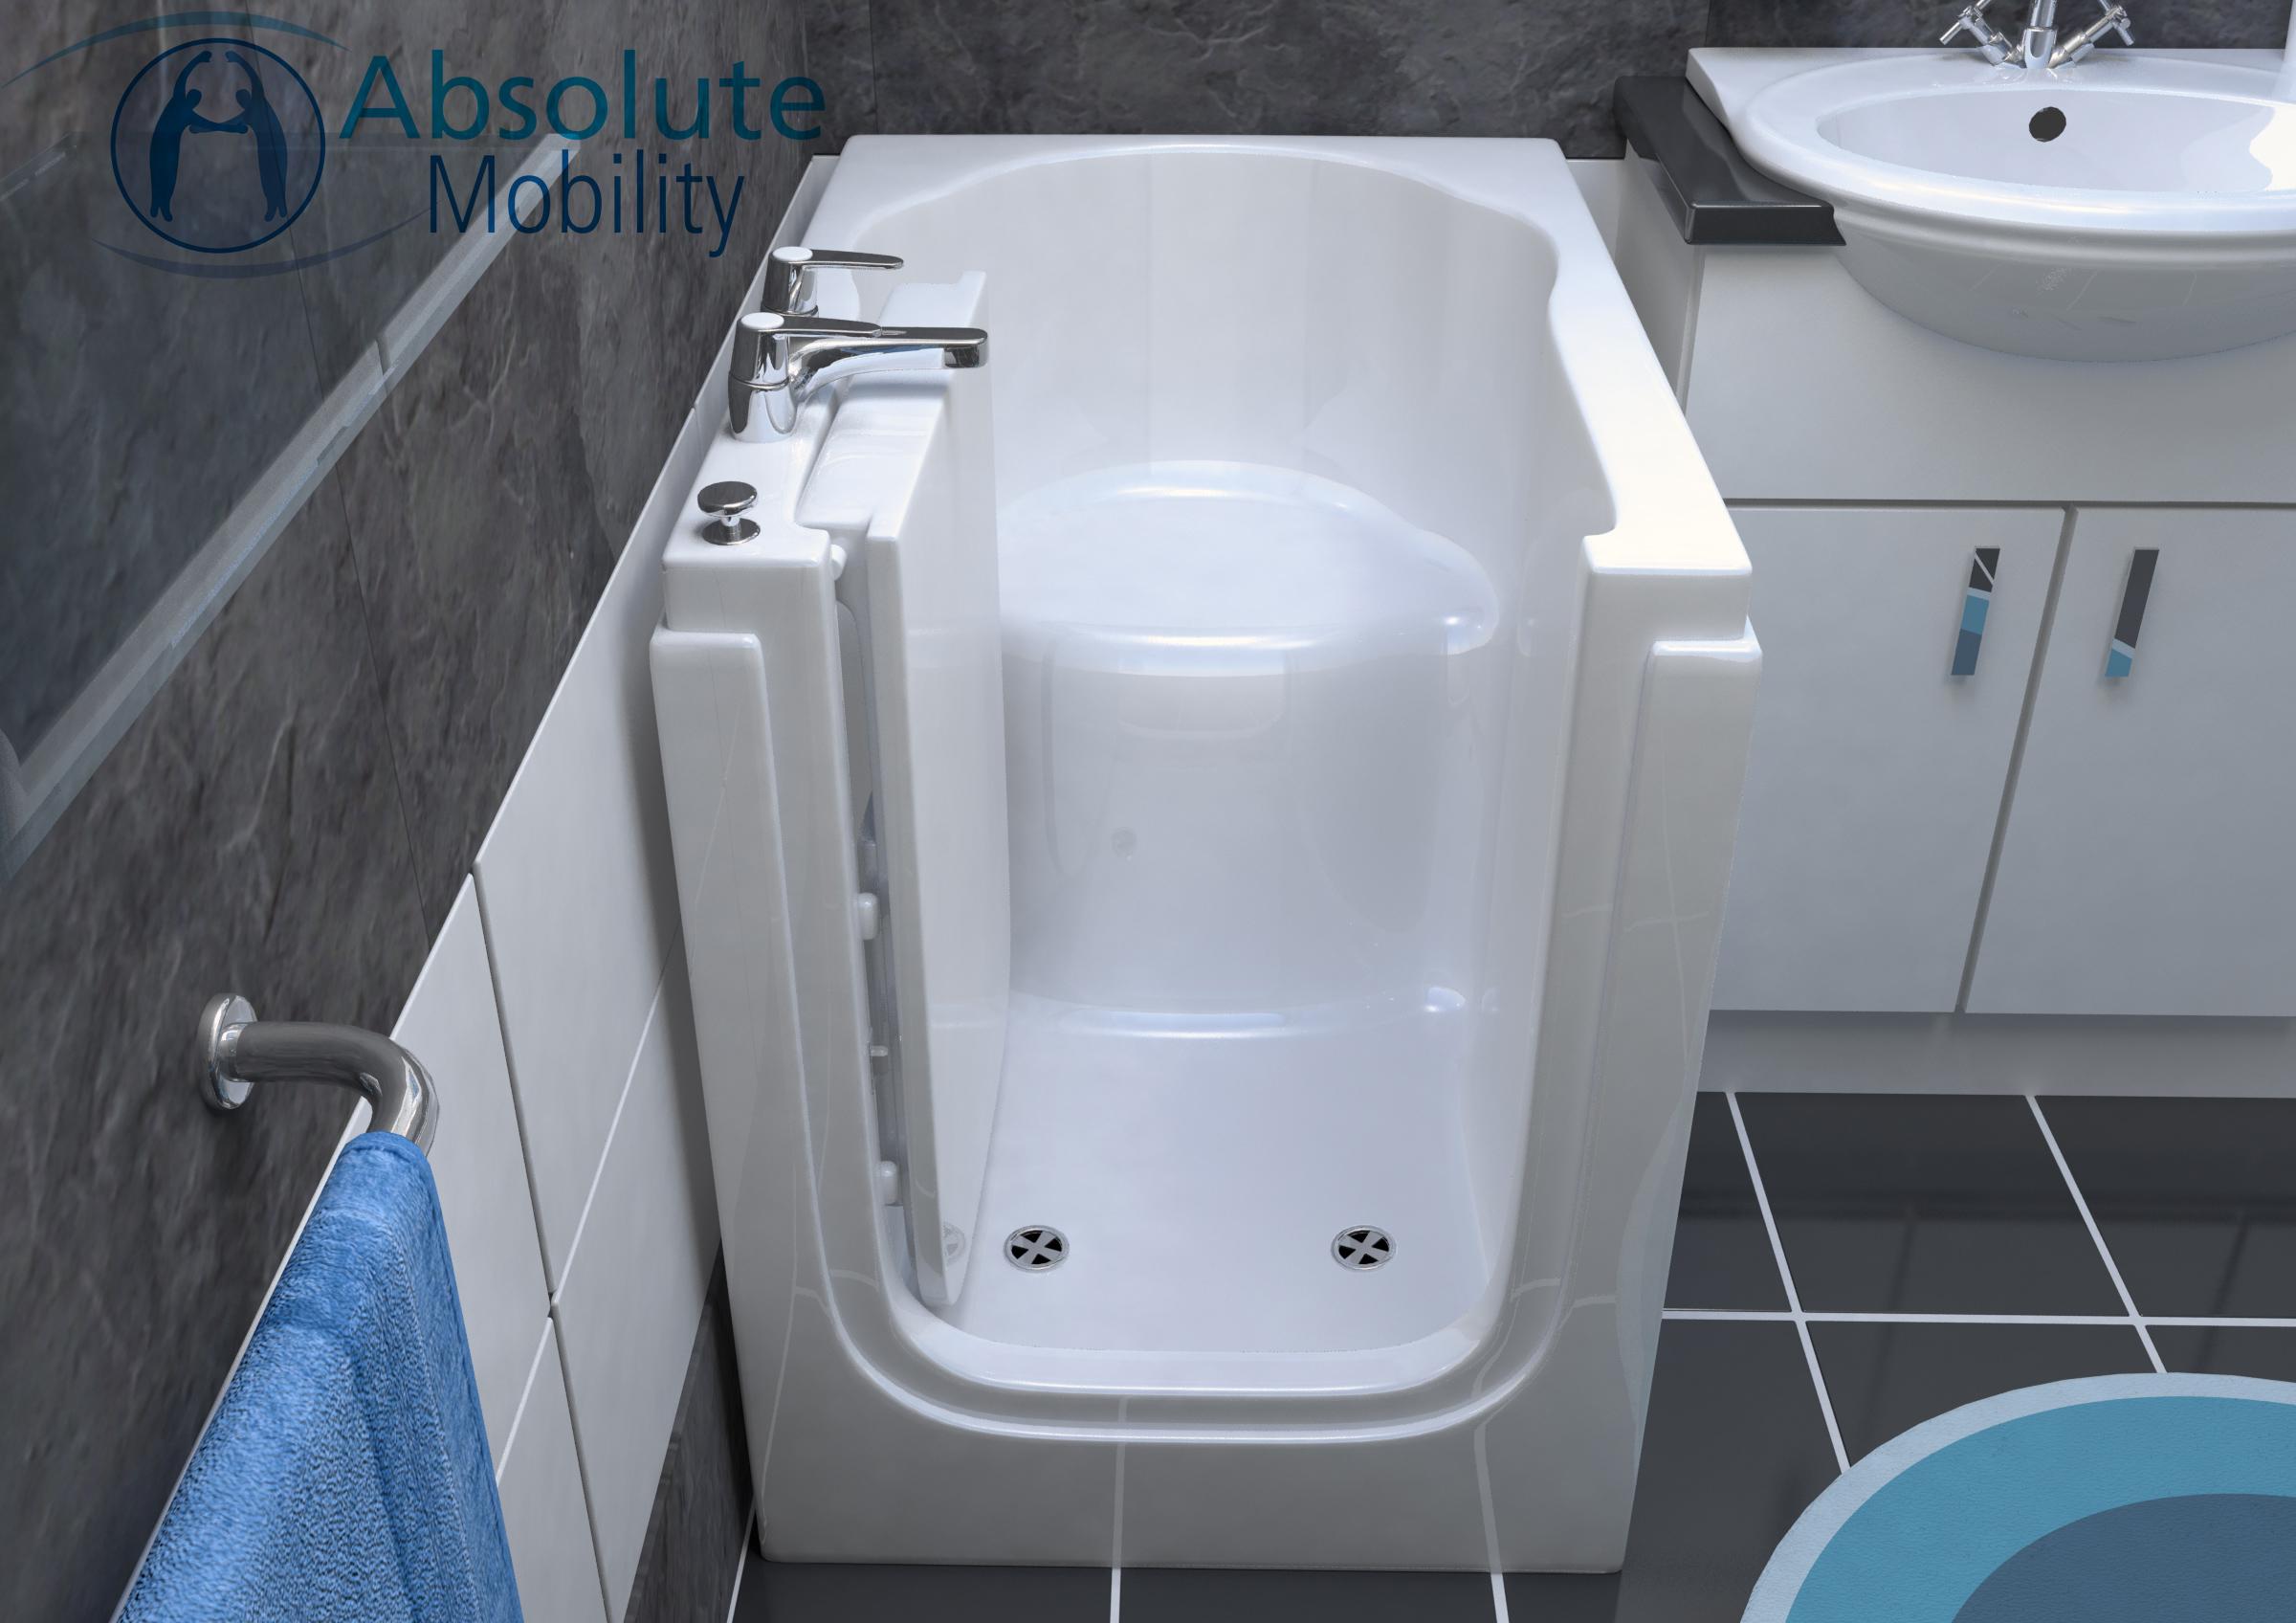 Perfect Bathing Aids For The Elderly Gallery Bathtub